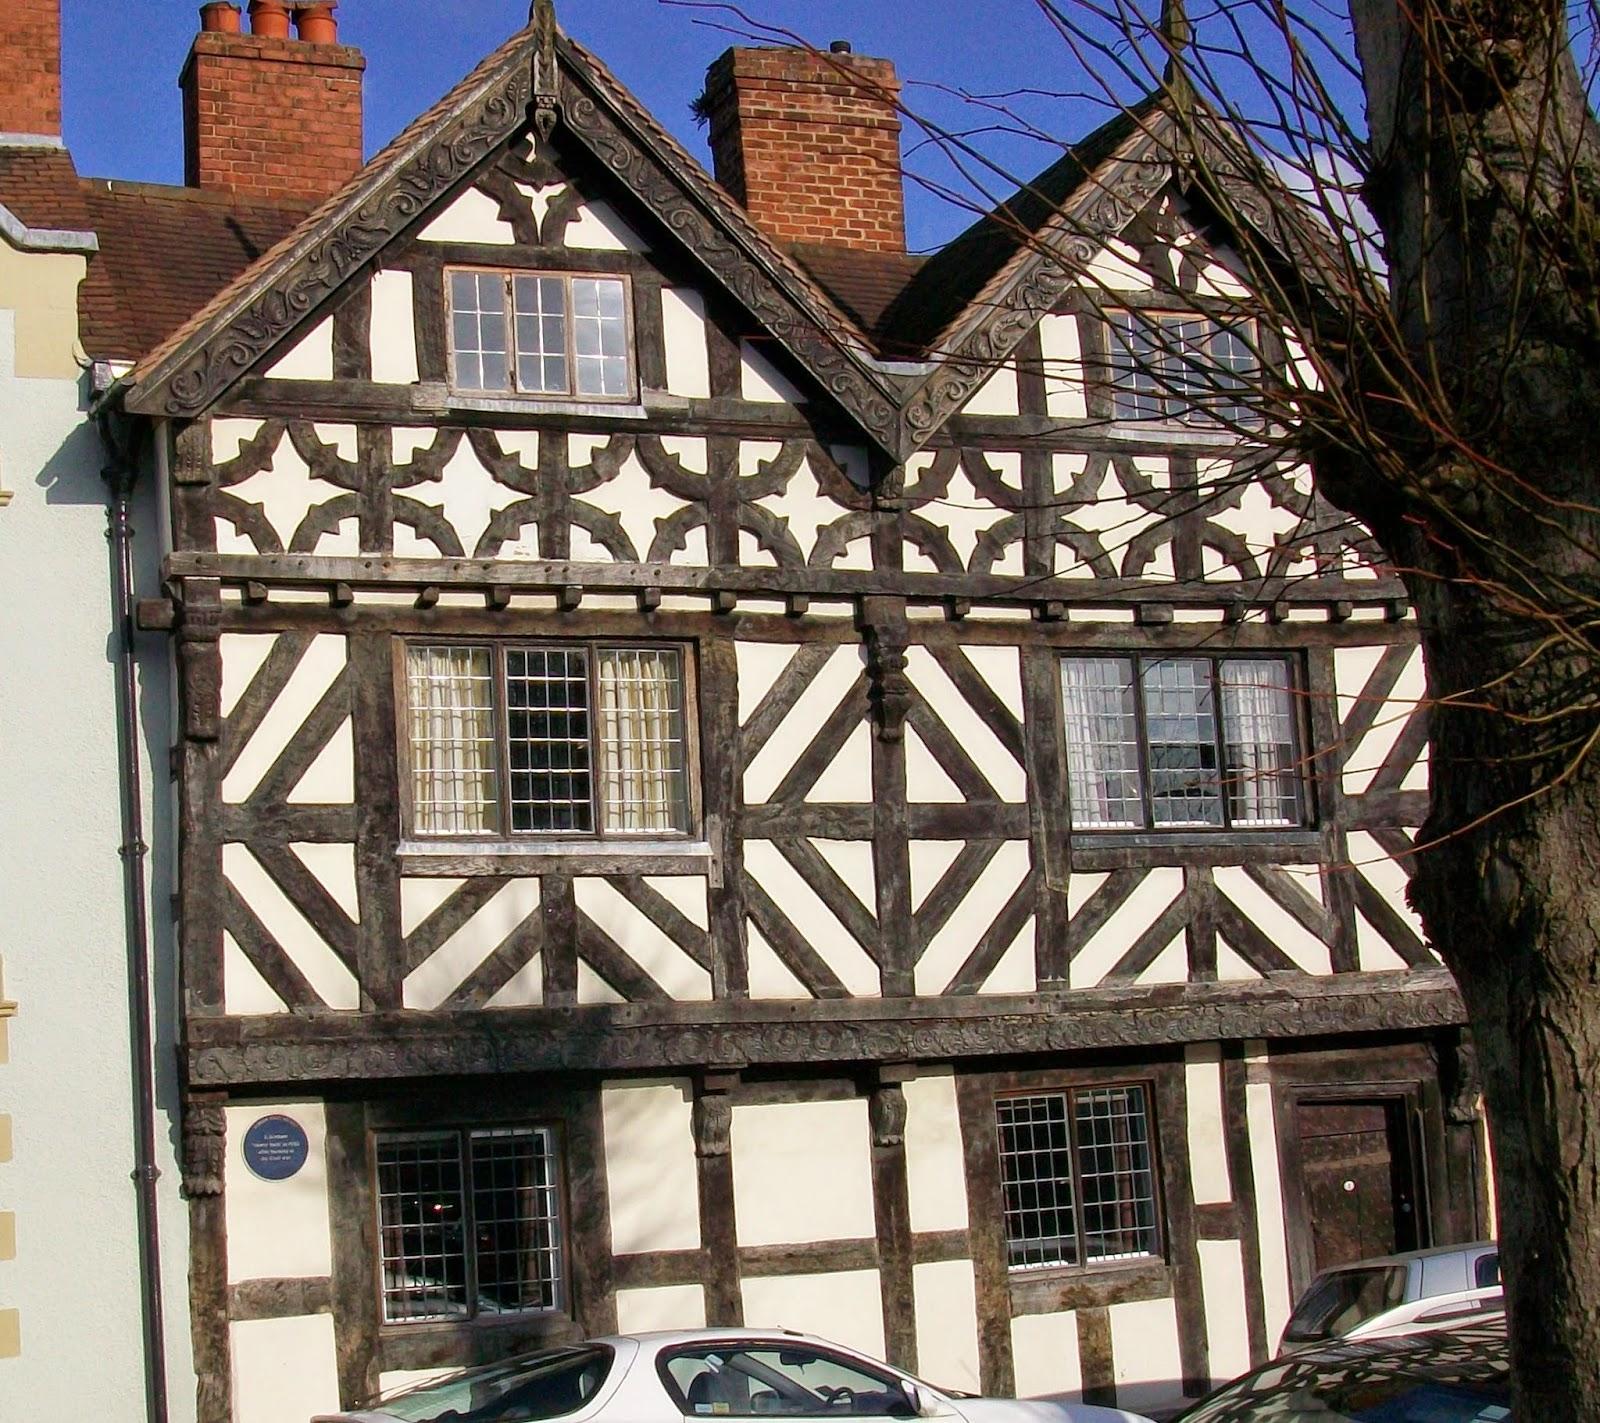 Wattle And Daub Houses Wattle And Daub Was a Fairly